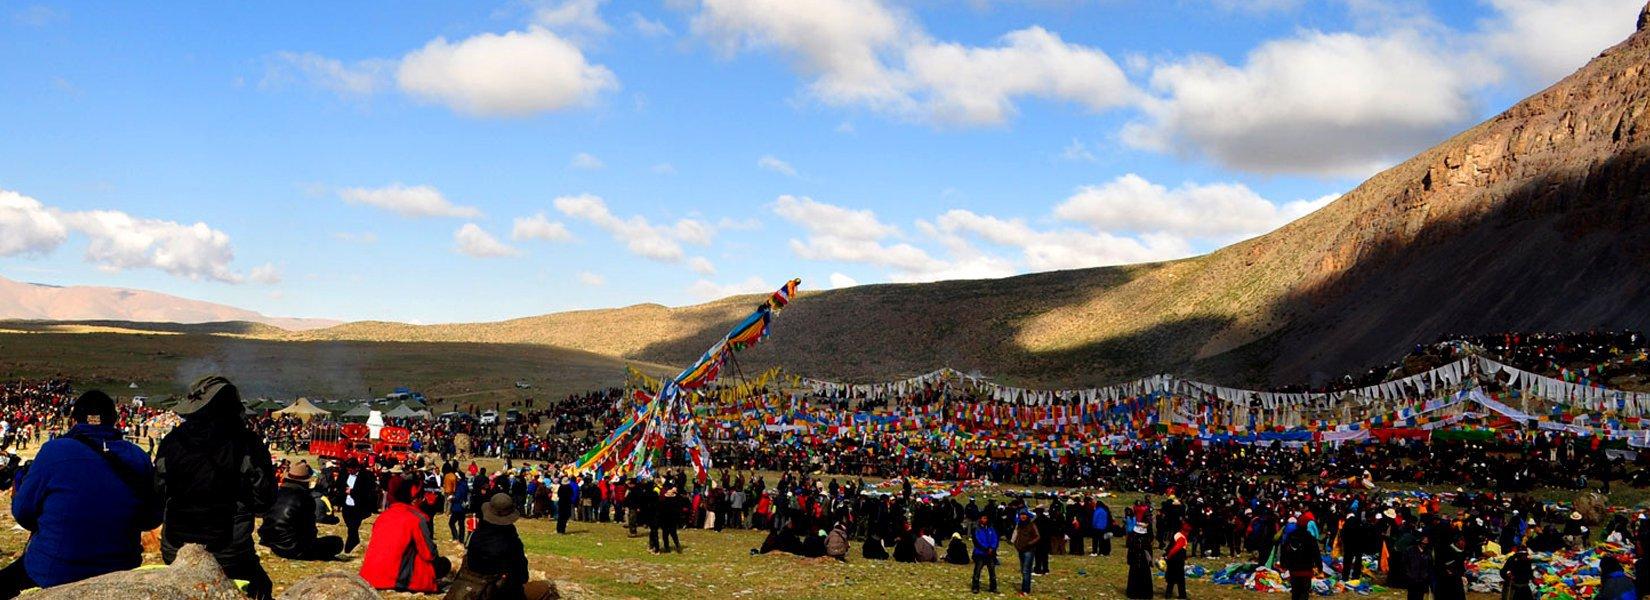 Calendrier Festival.Calendrier Et Festivals Tibetains Mandalas Life